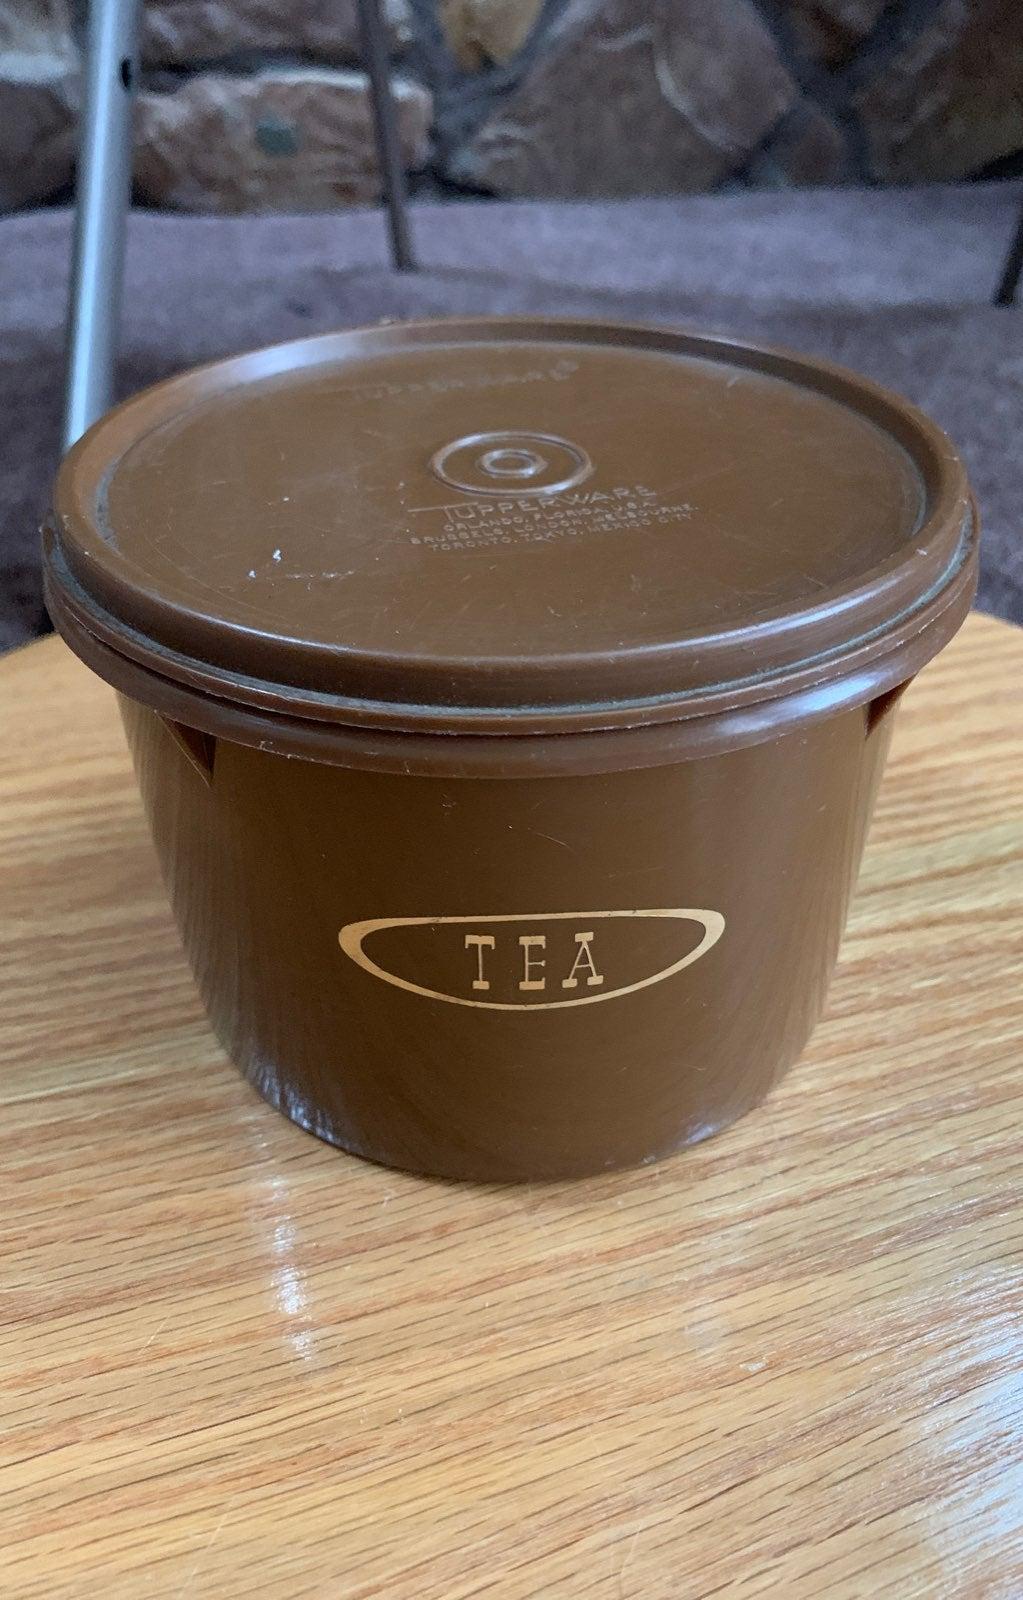 Tupperware tea canister vintage brown